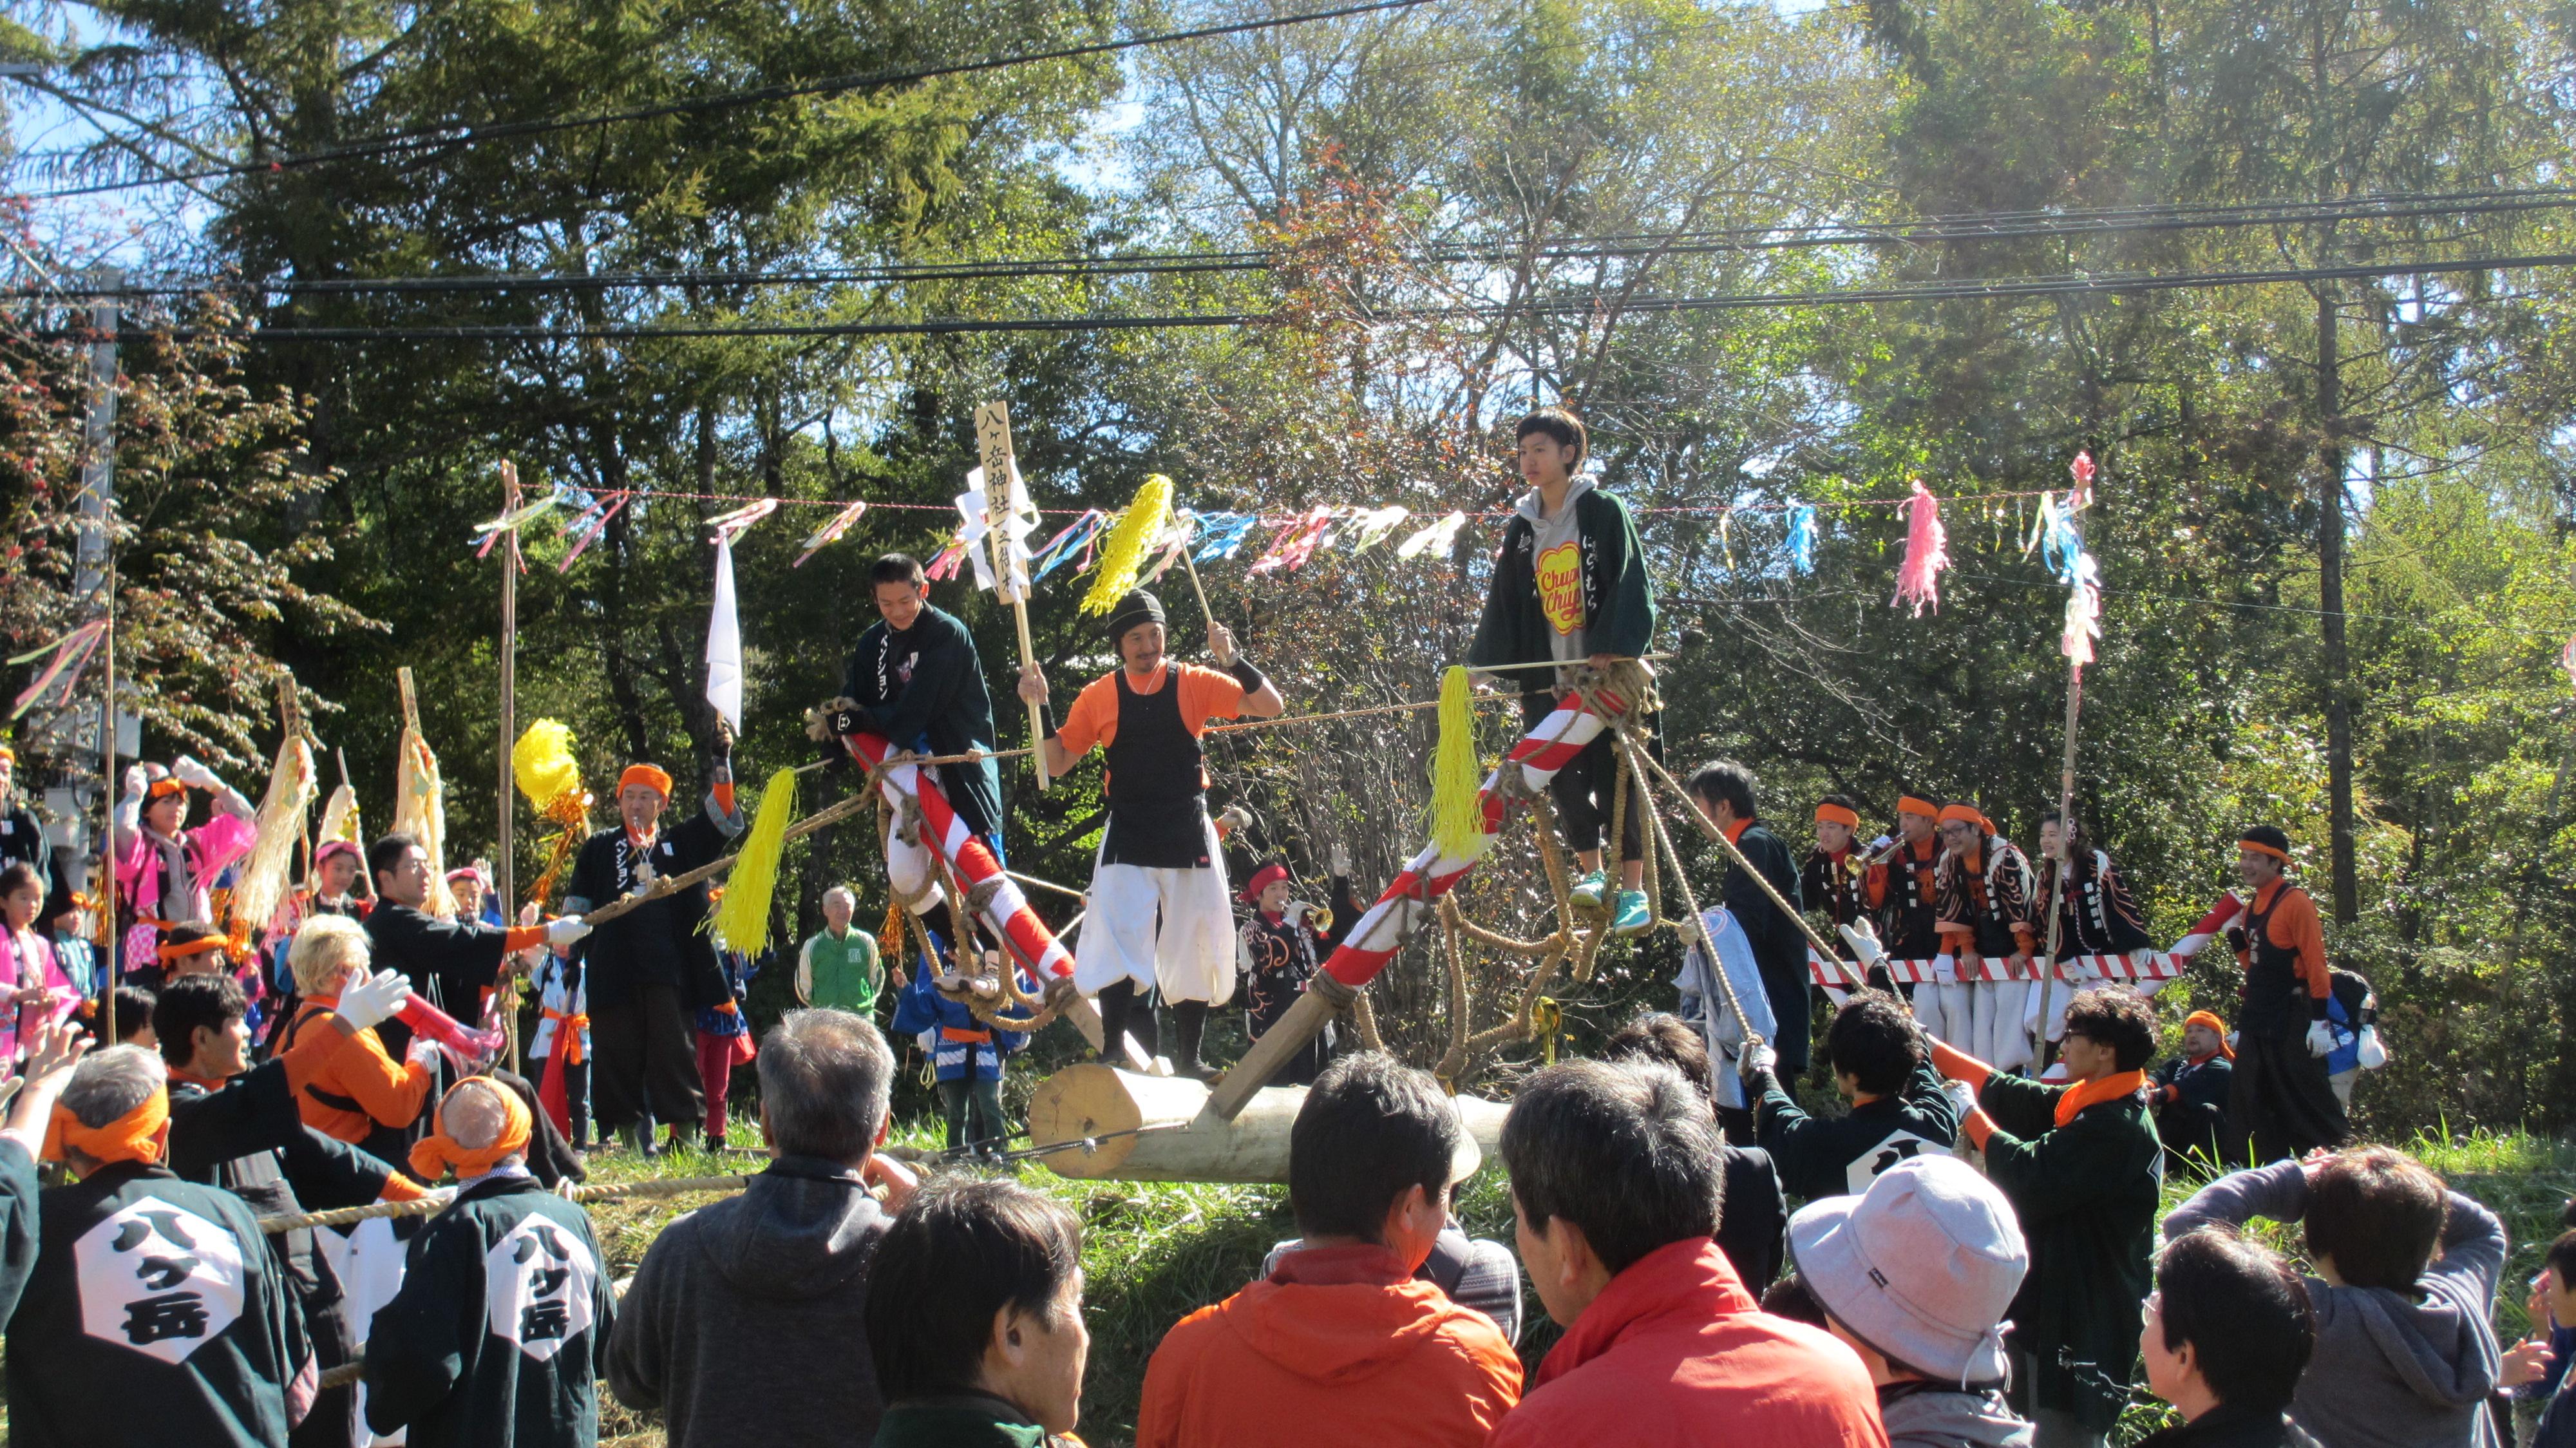 http://www.alpico.co.jp/shikinomori/news/images/IMG_6811.JPG